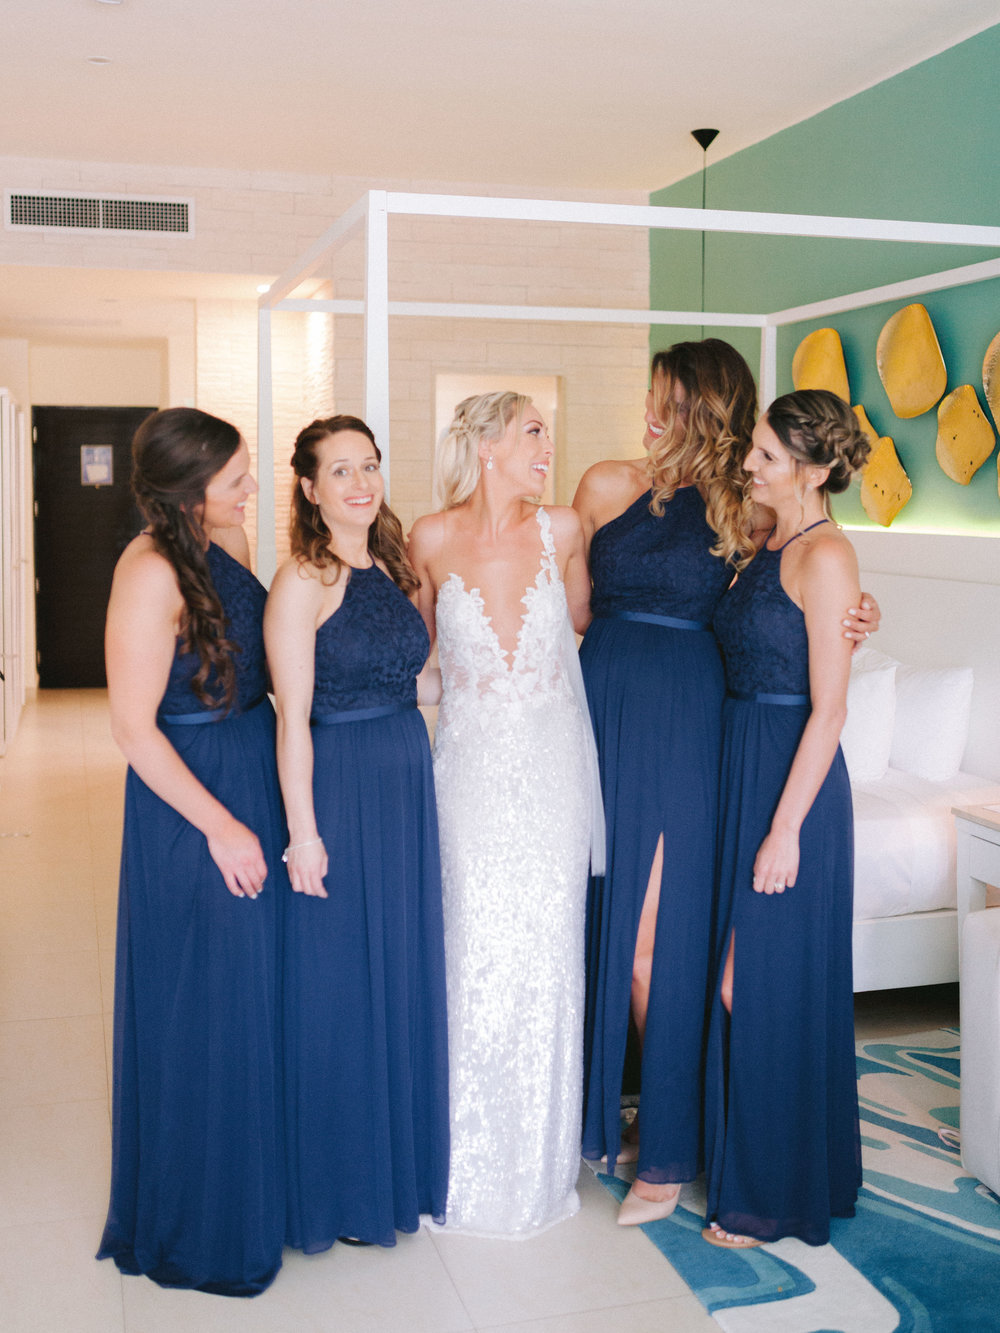 Kim_Jeff_Cancun Wedding_Getting_Ready_Kurtz_Orpia (85 of 105).jpg